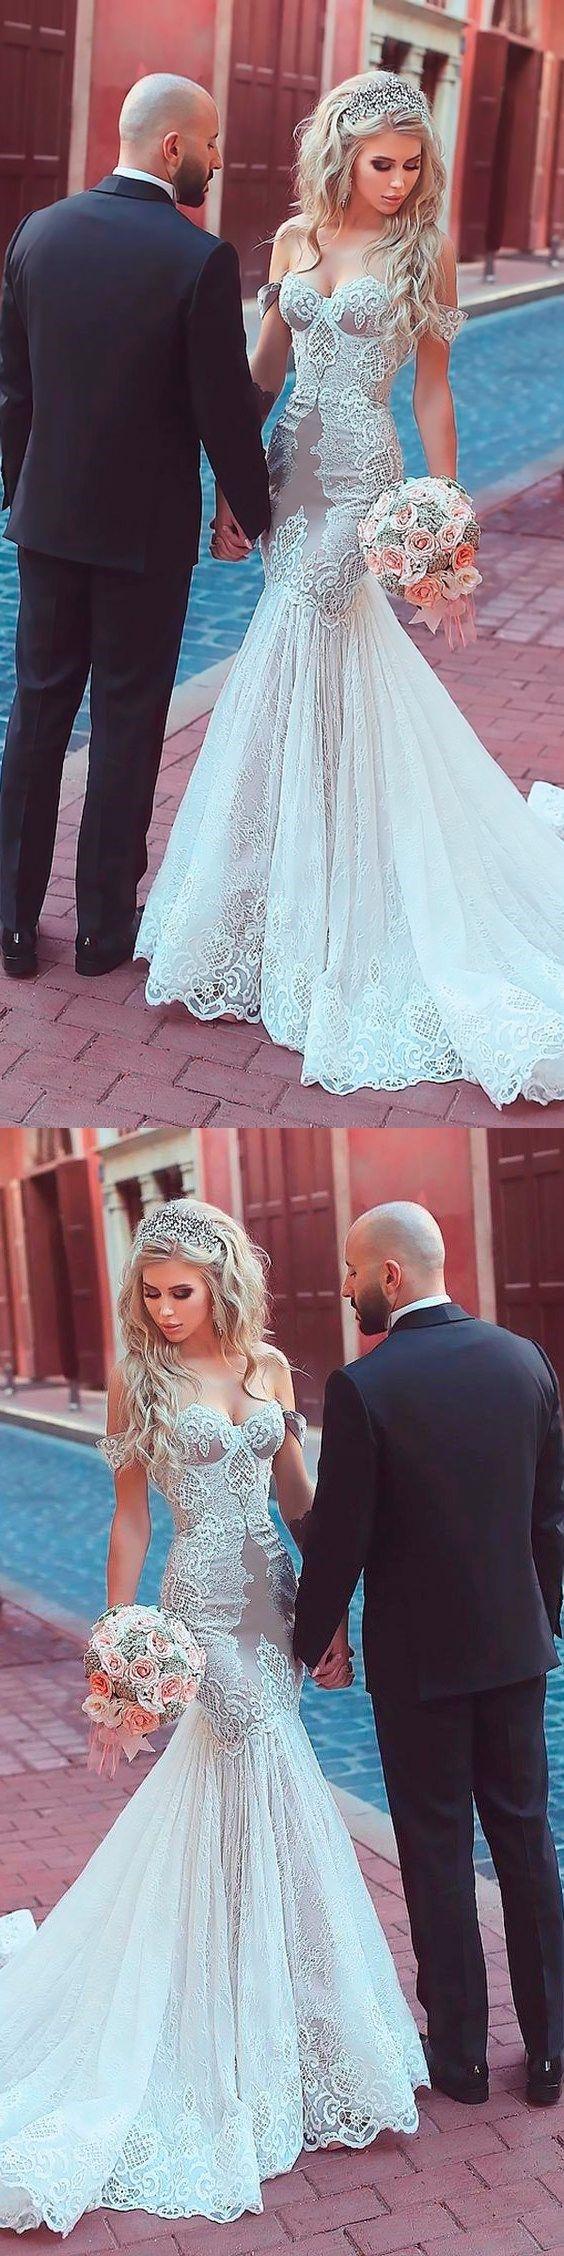 Lace Wedding Dresses Off-the-shoulder Romantic Long Train Mermaid Bridal Gown JKW263